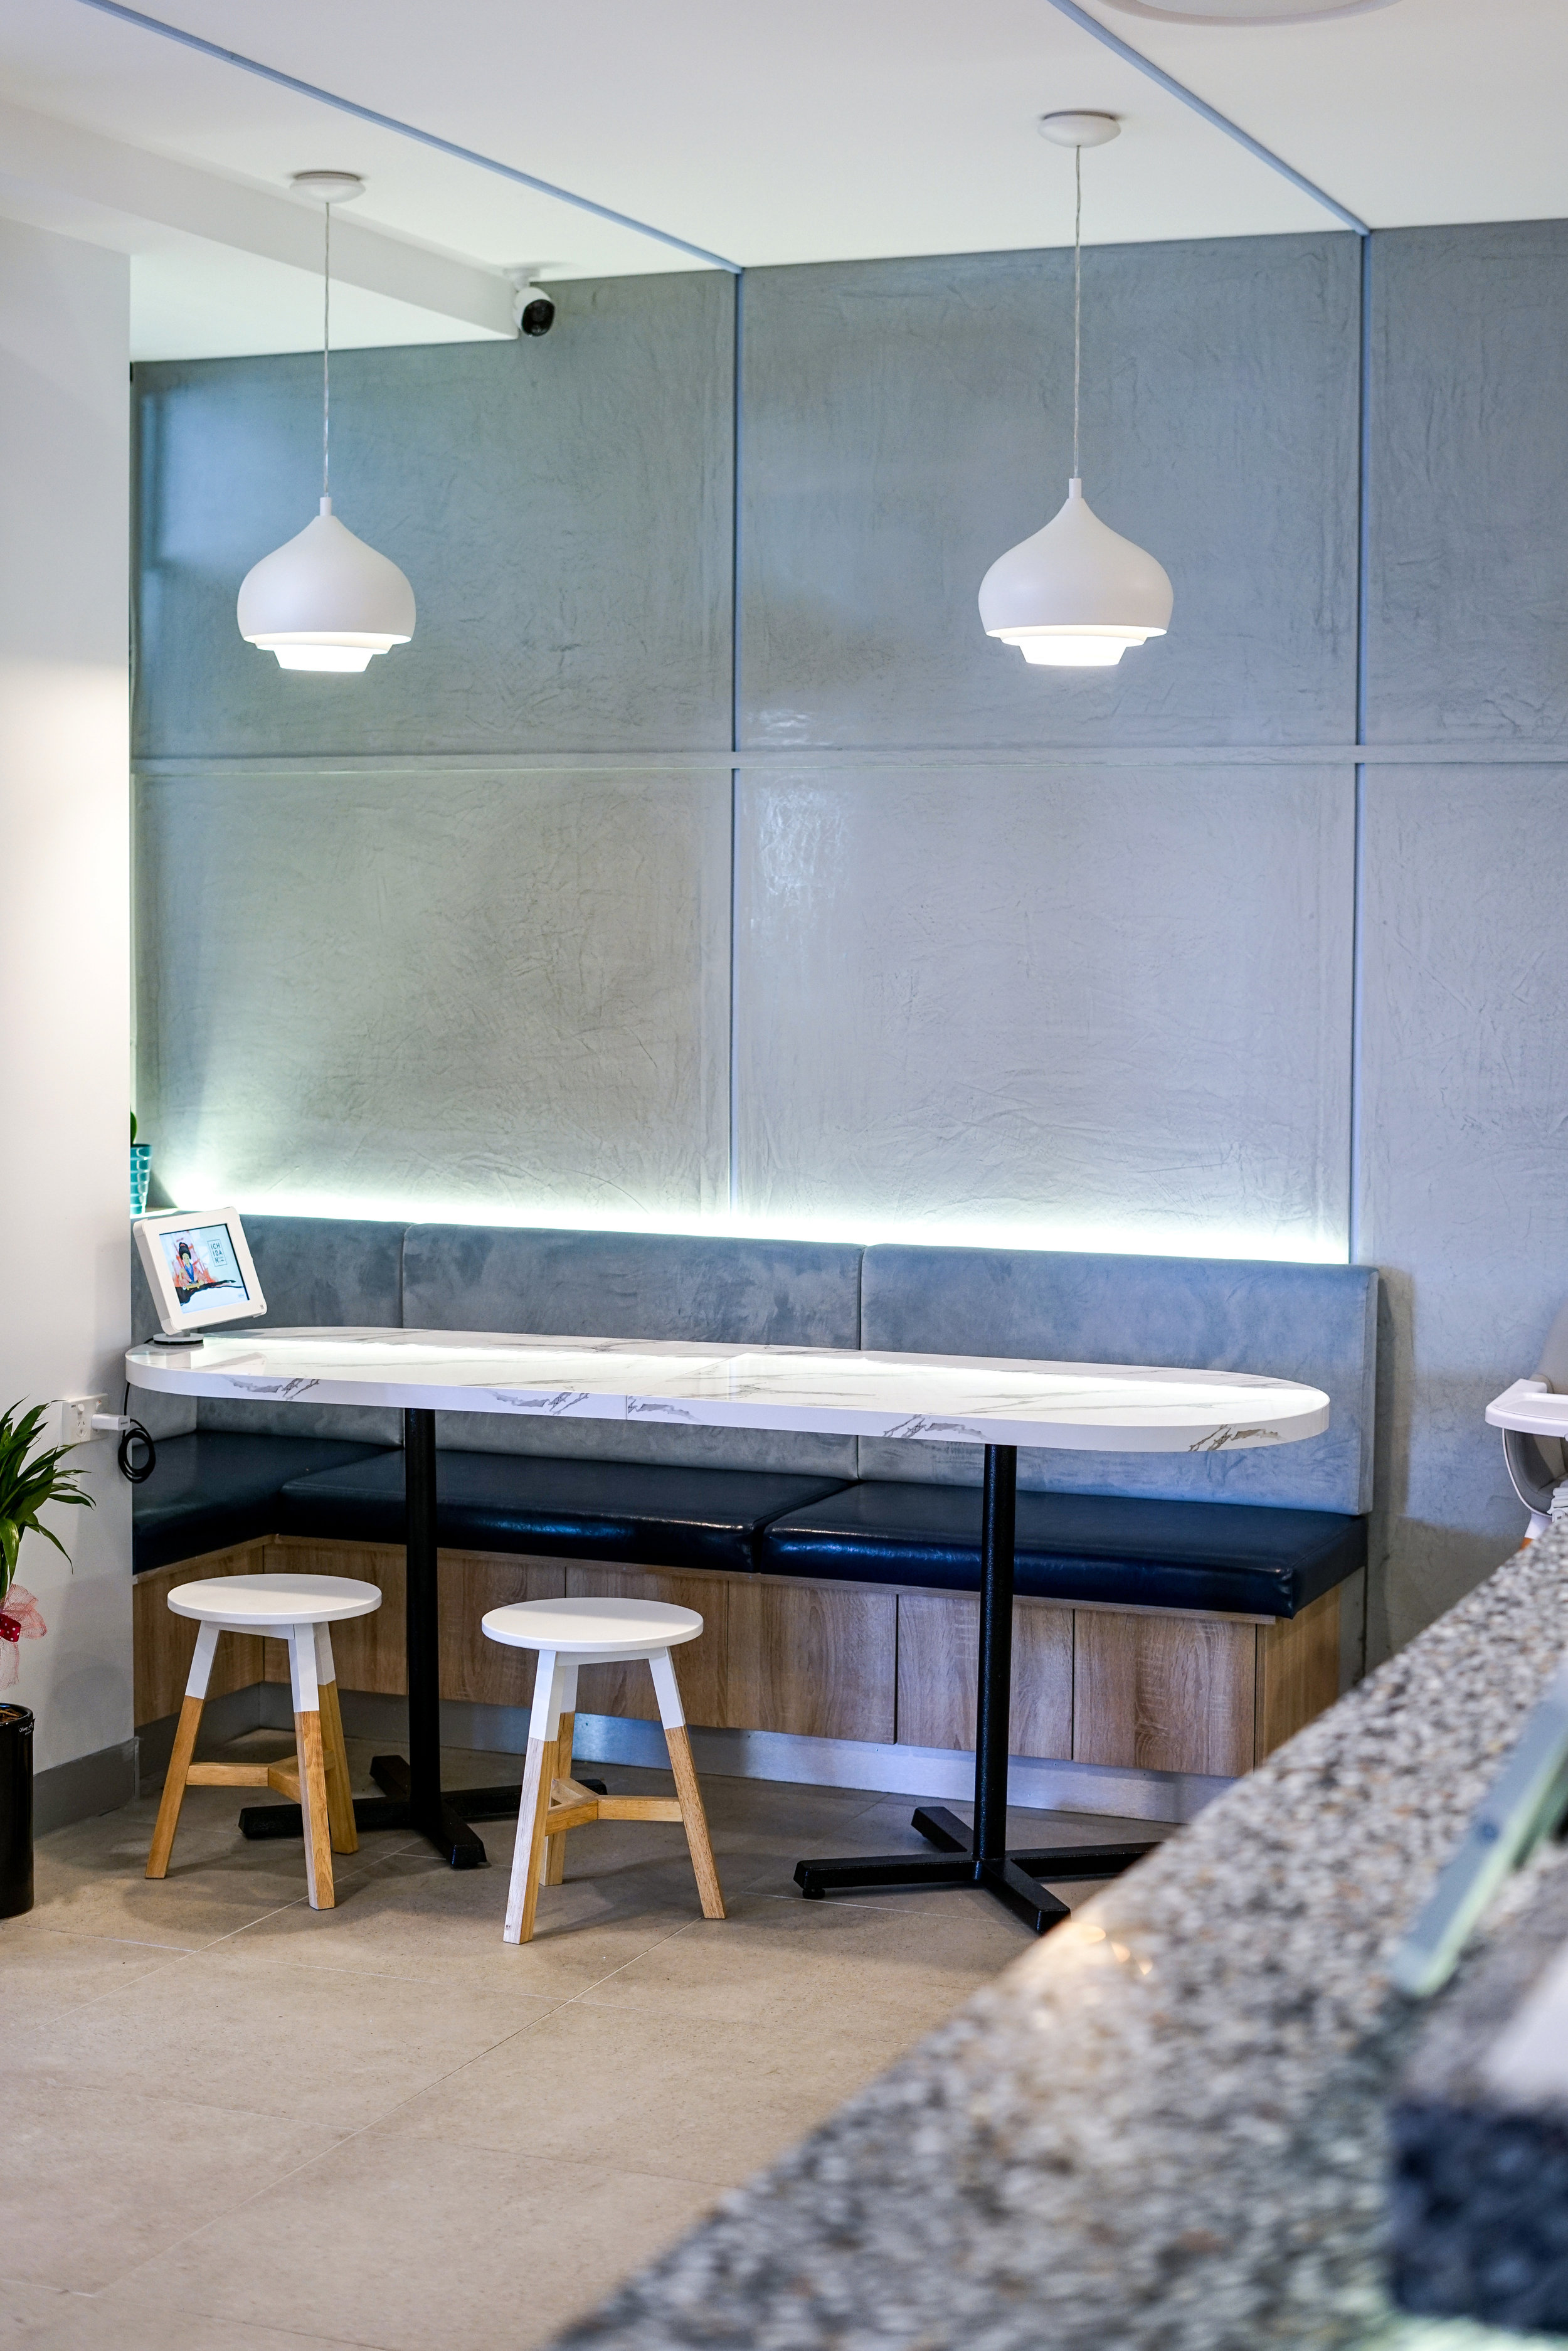 Ichiban Banquette Seating - Collectivus Interior Design